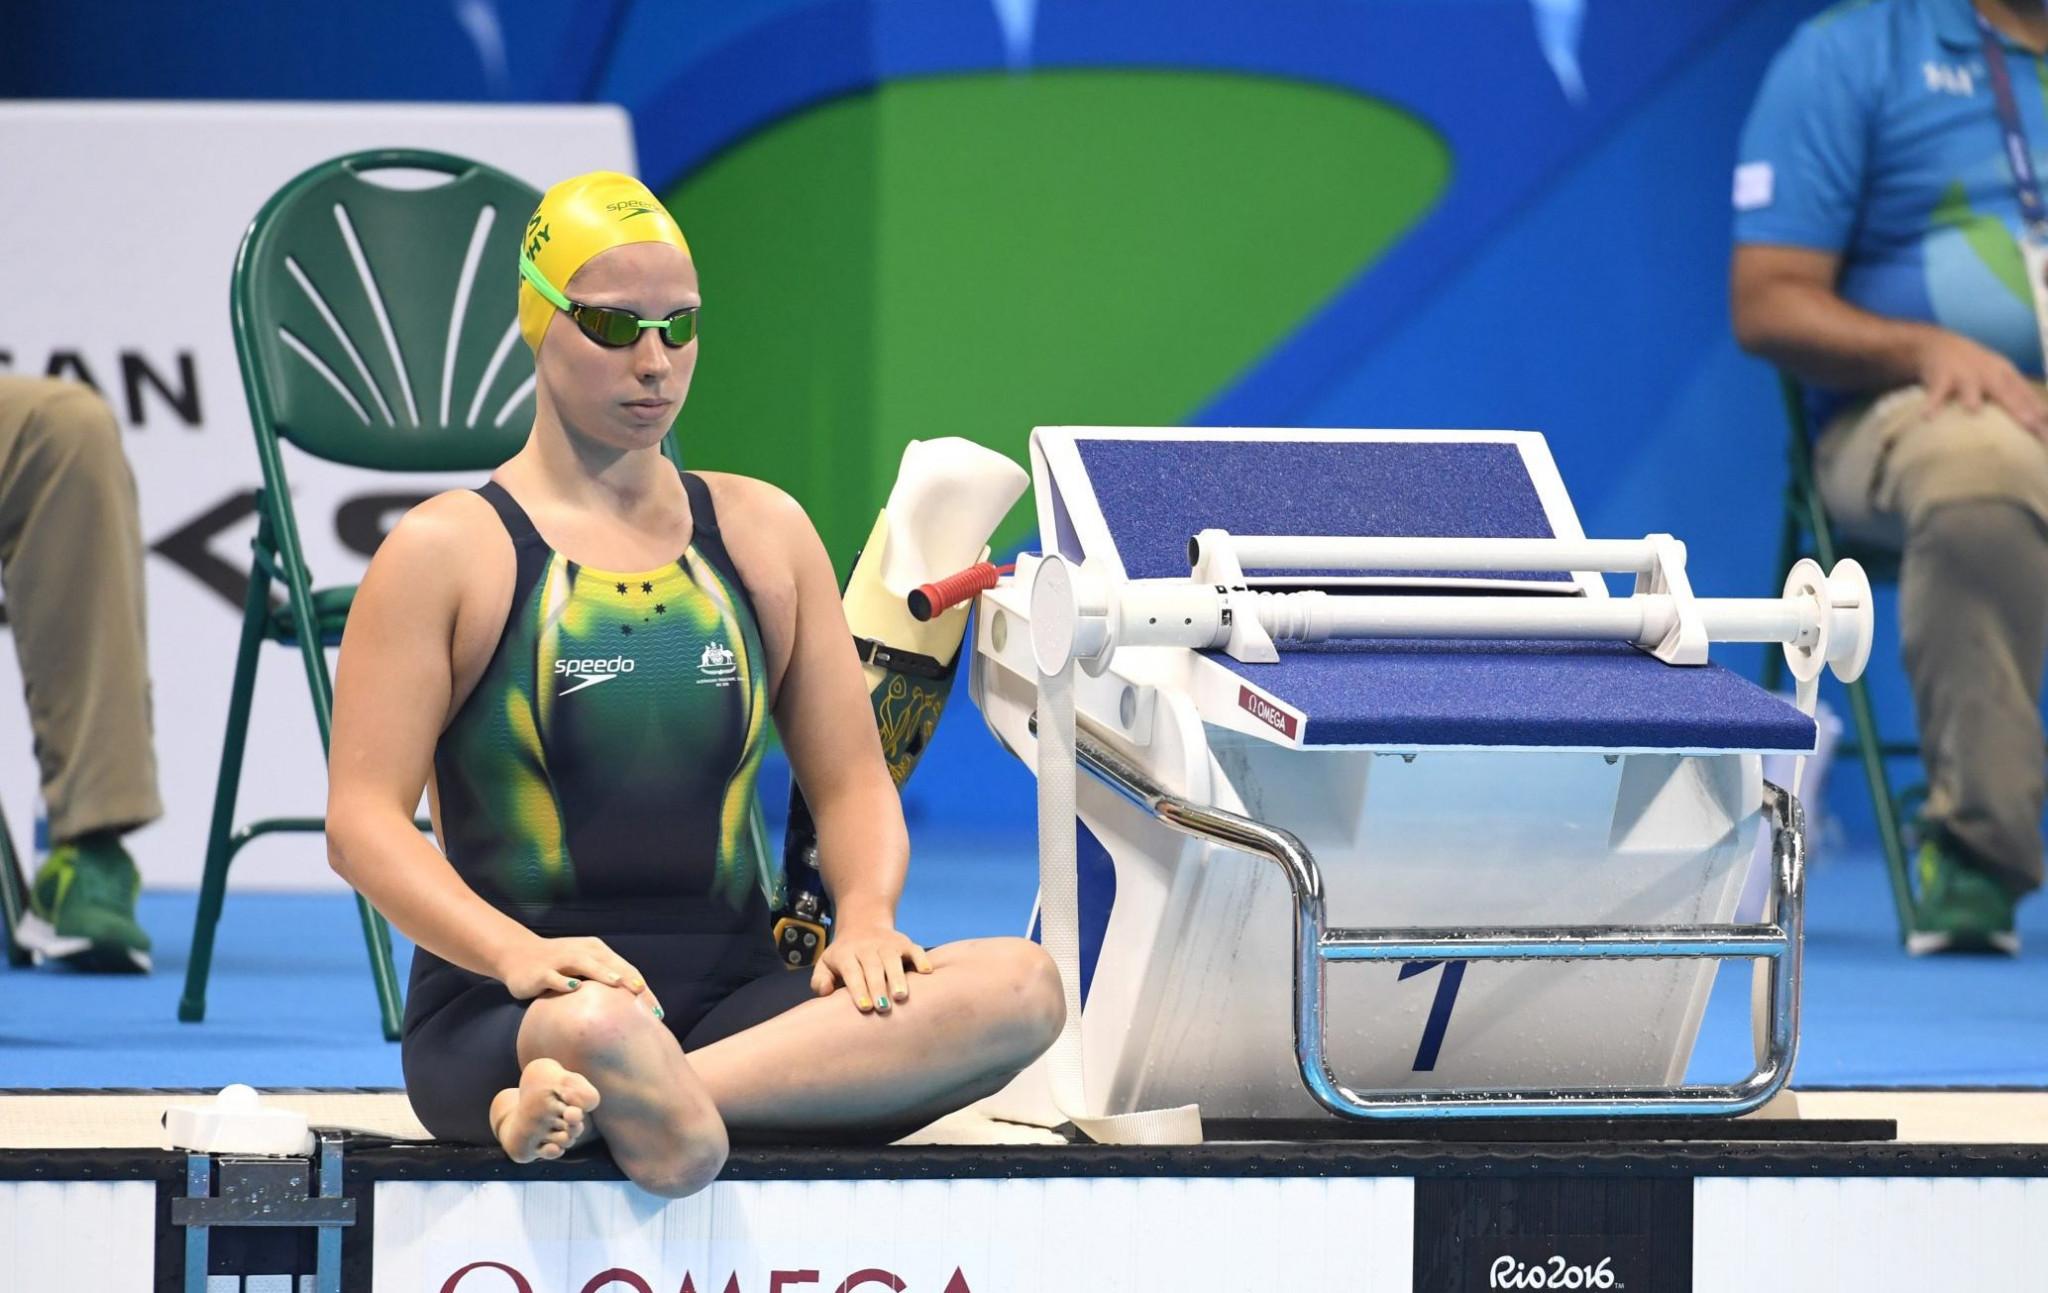 Speedo renew partnership with Australian Paralympic swimmers